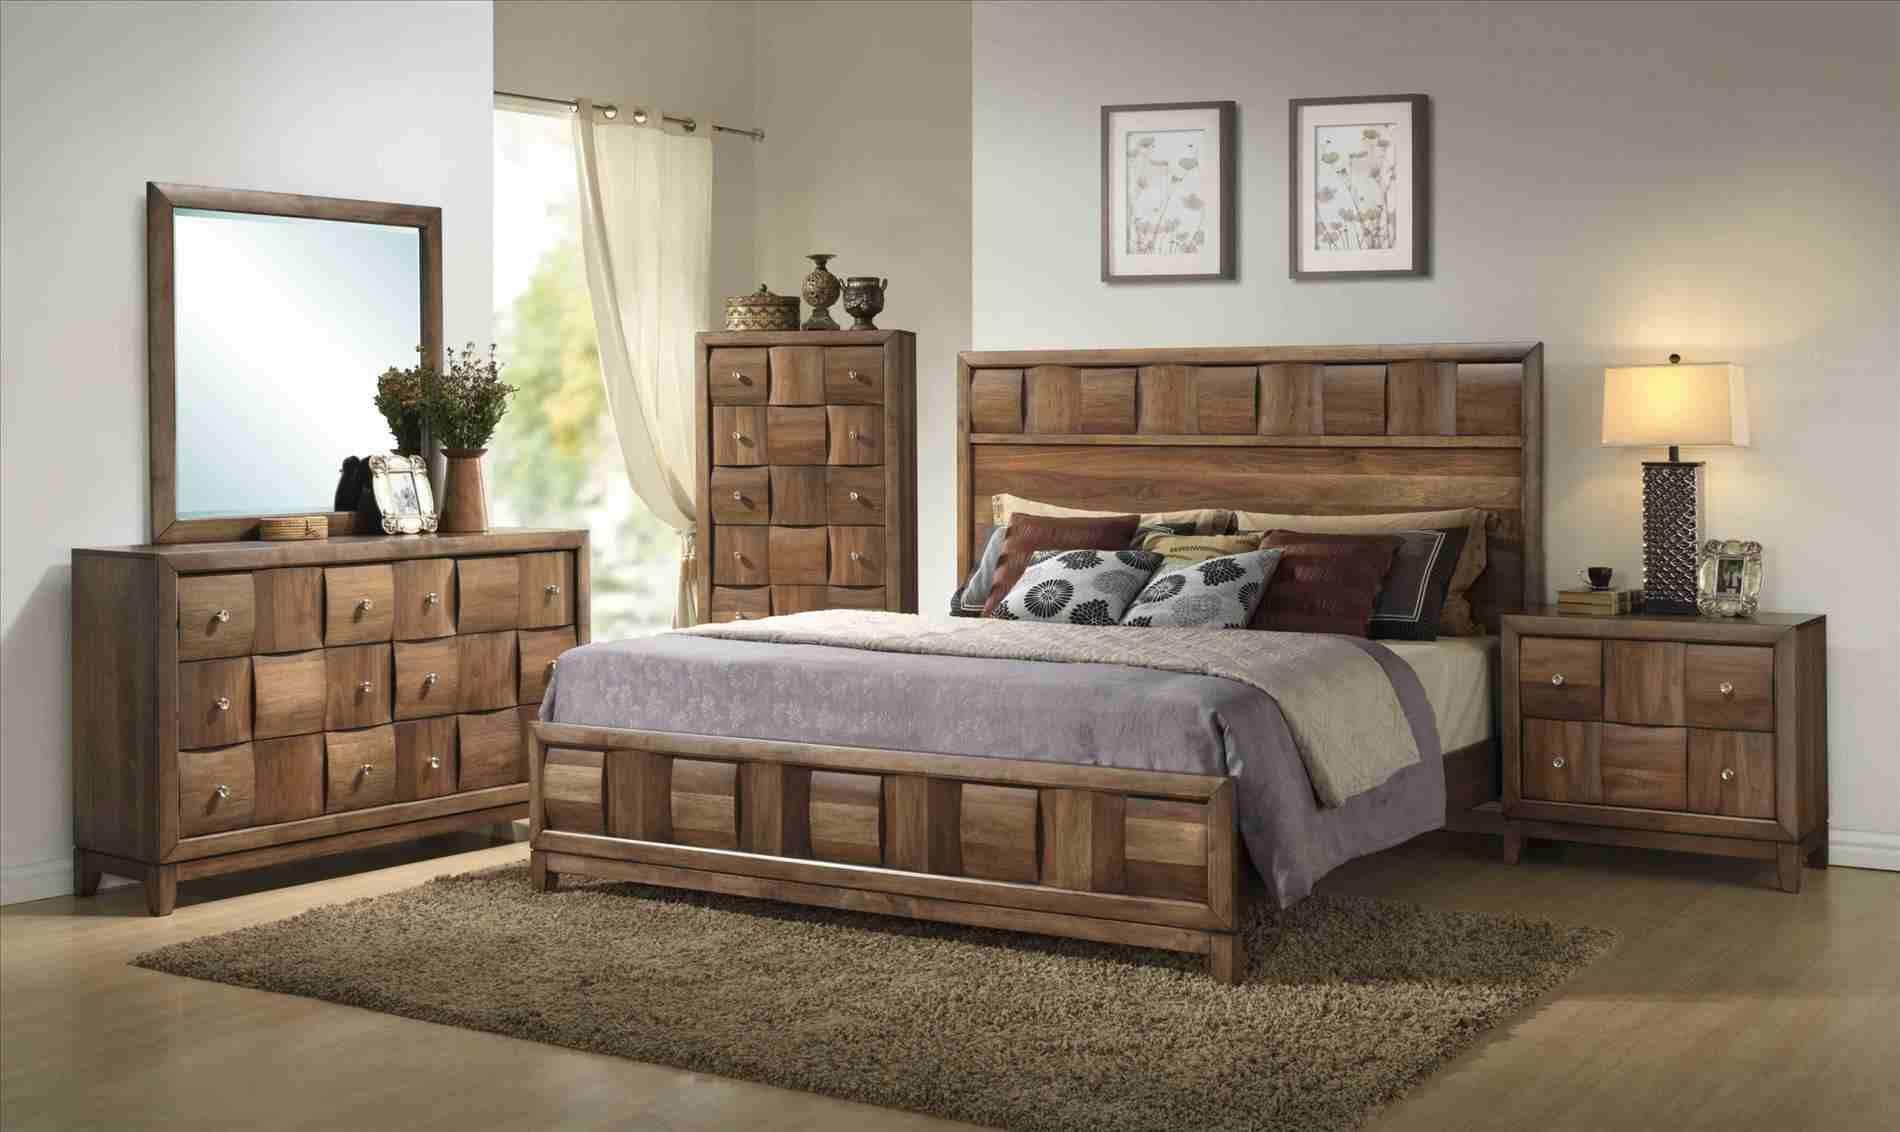 Solid Wood Bedroom Furniture Wood Bedroom Sets Oak Bedroom